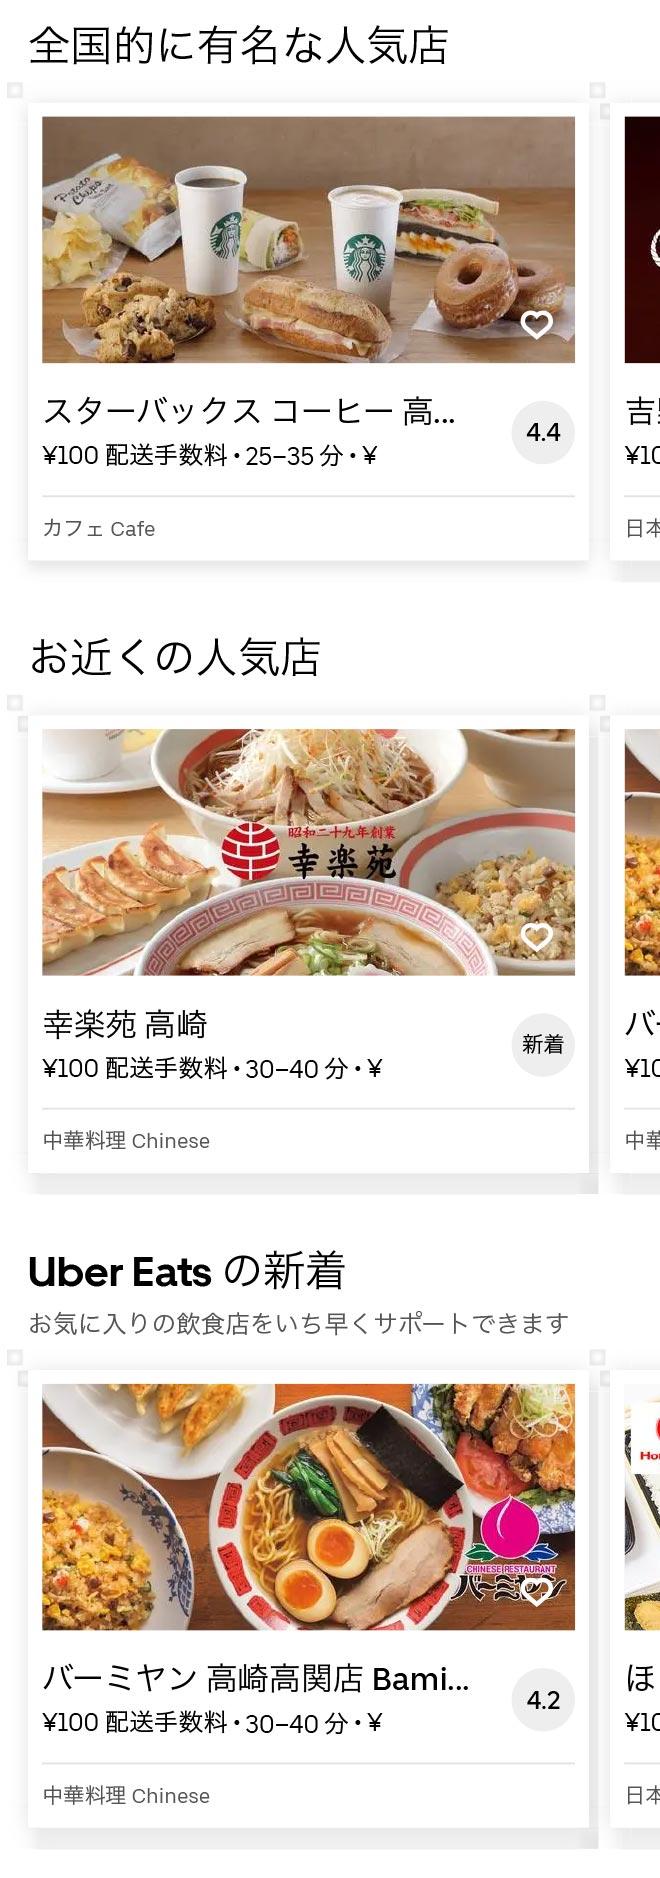 Tonyamachi menu 2010 01